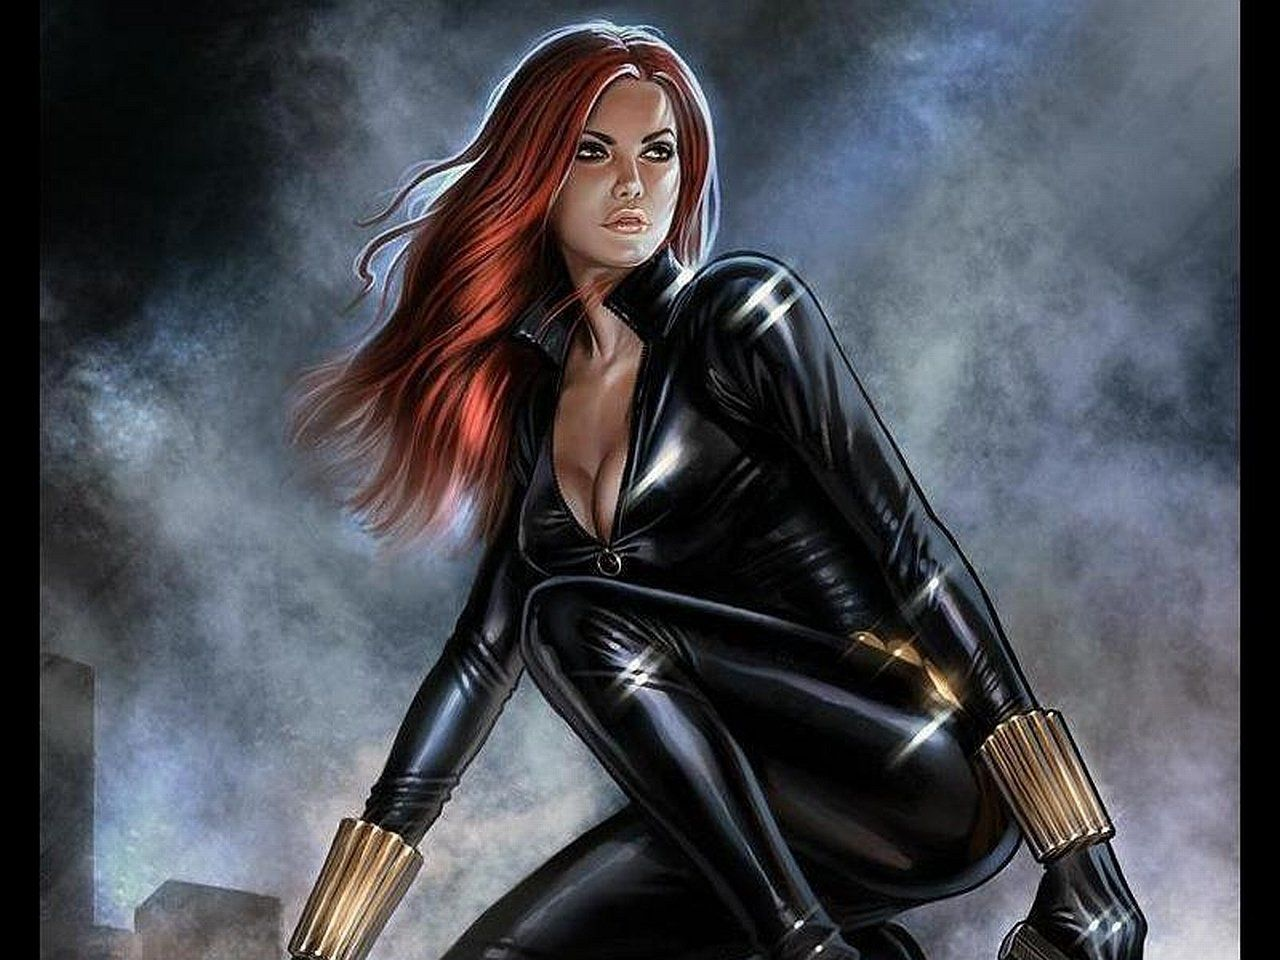 55 Black Widow Wallpapers   Download at WallpaperBro 1280x960